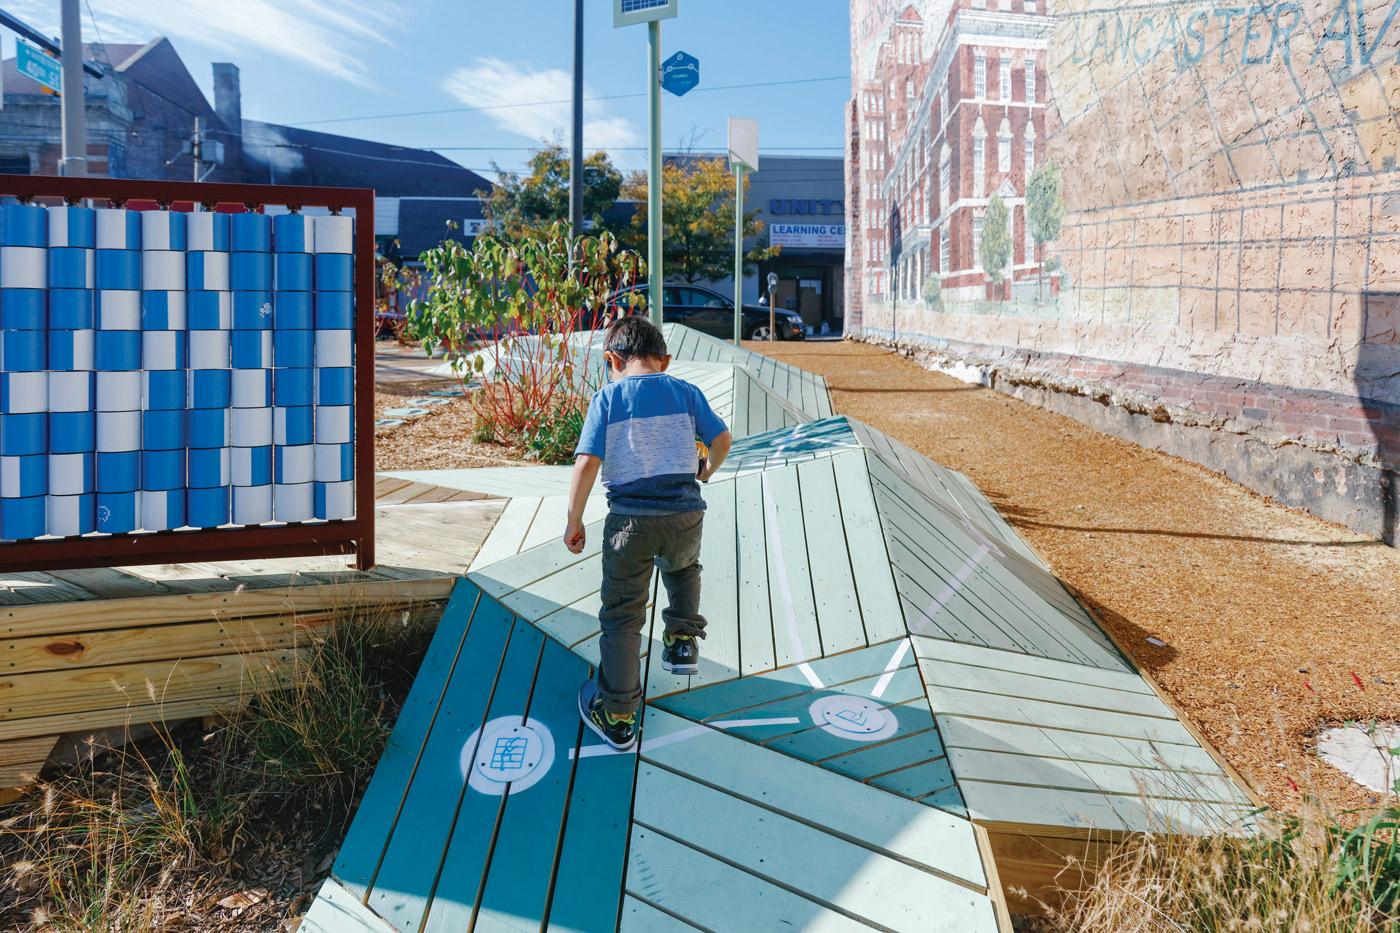 Urban Thinkscape project, West Philadelphia